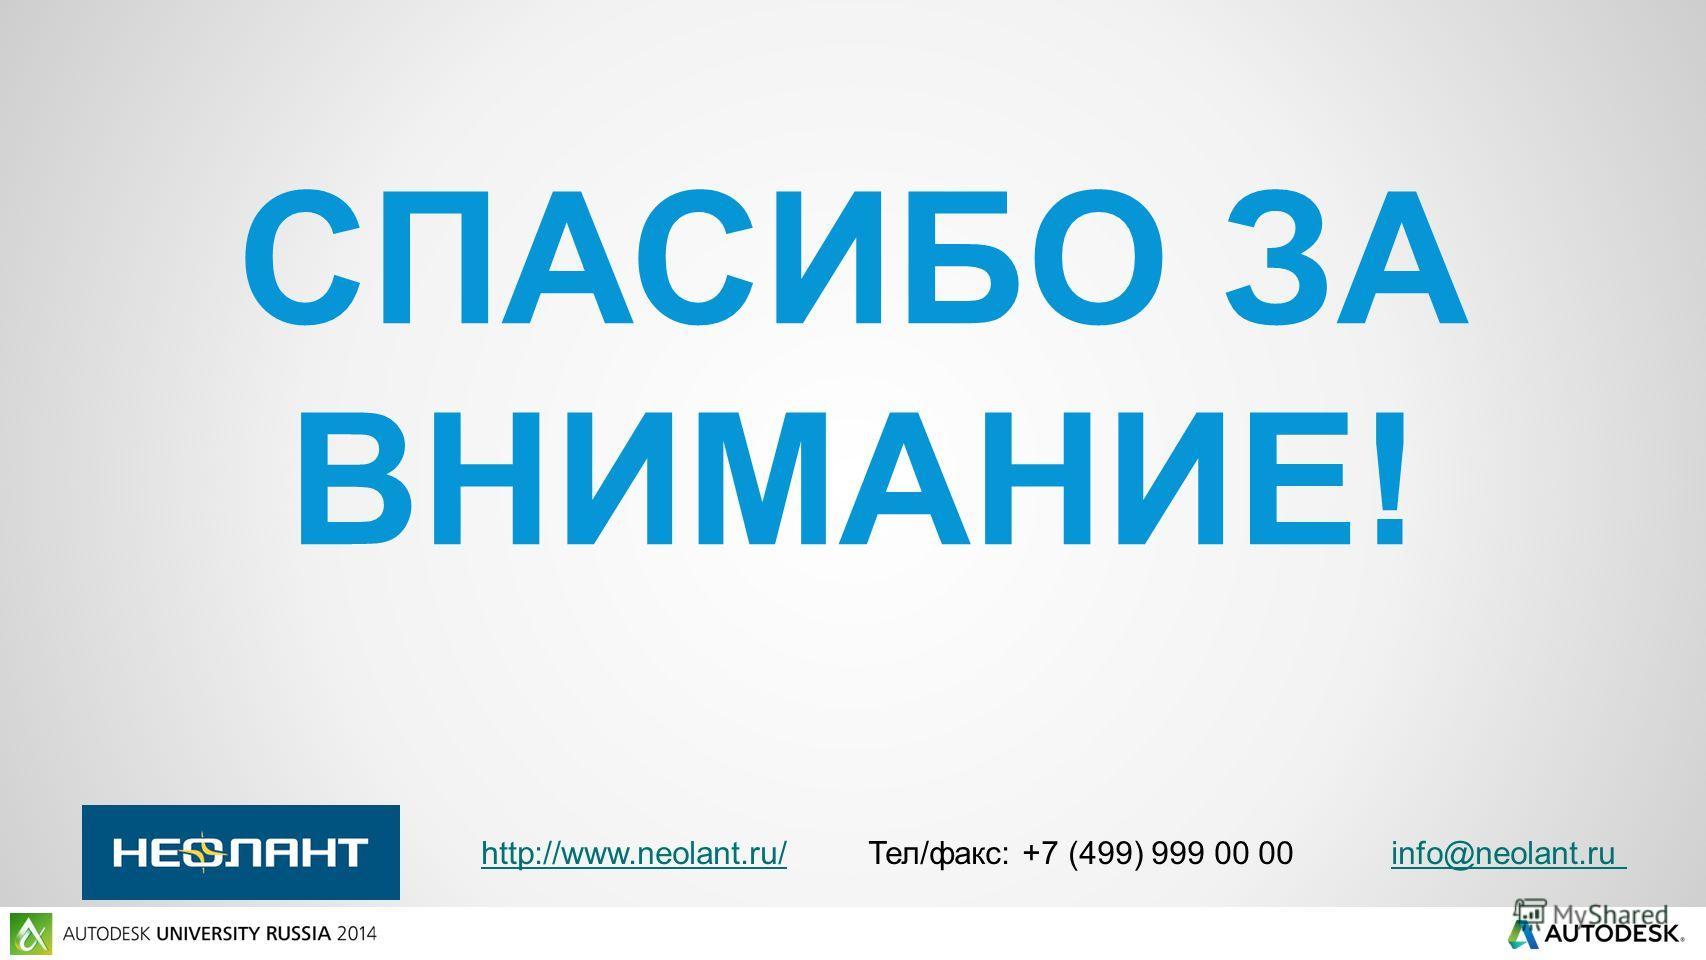 http://www.neolant.ru/http://www.neolant.ru/ Тел/факс: +7 (499) 999 00 00 info@neolant.ru info@neolant.ru СПАСИБО ЗА ВНИМАНИЕ!